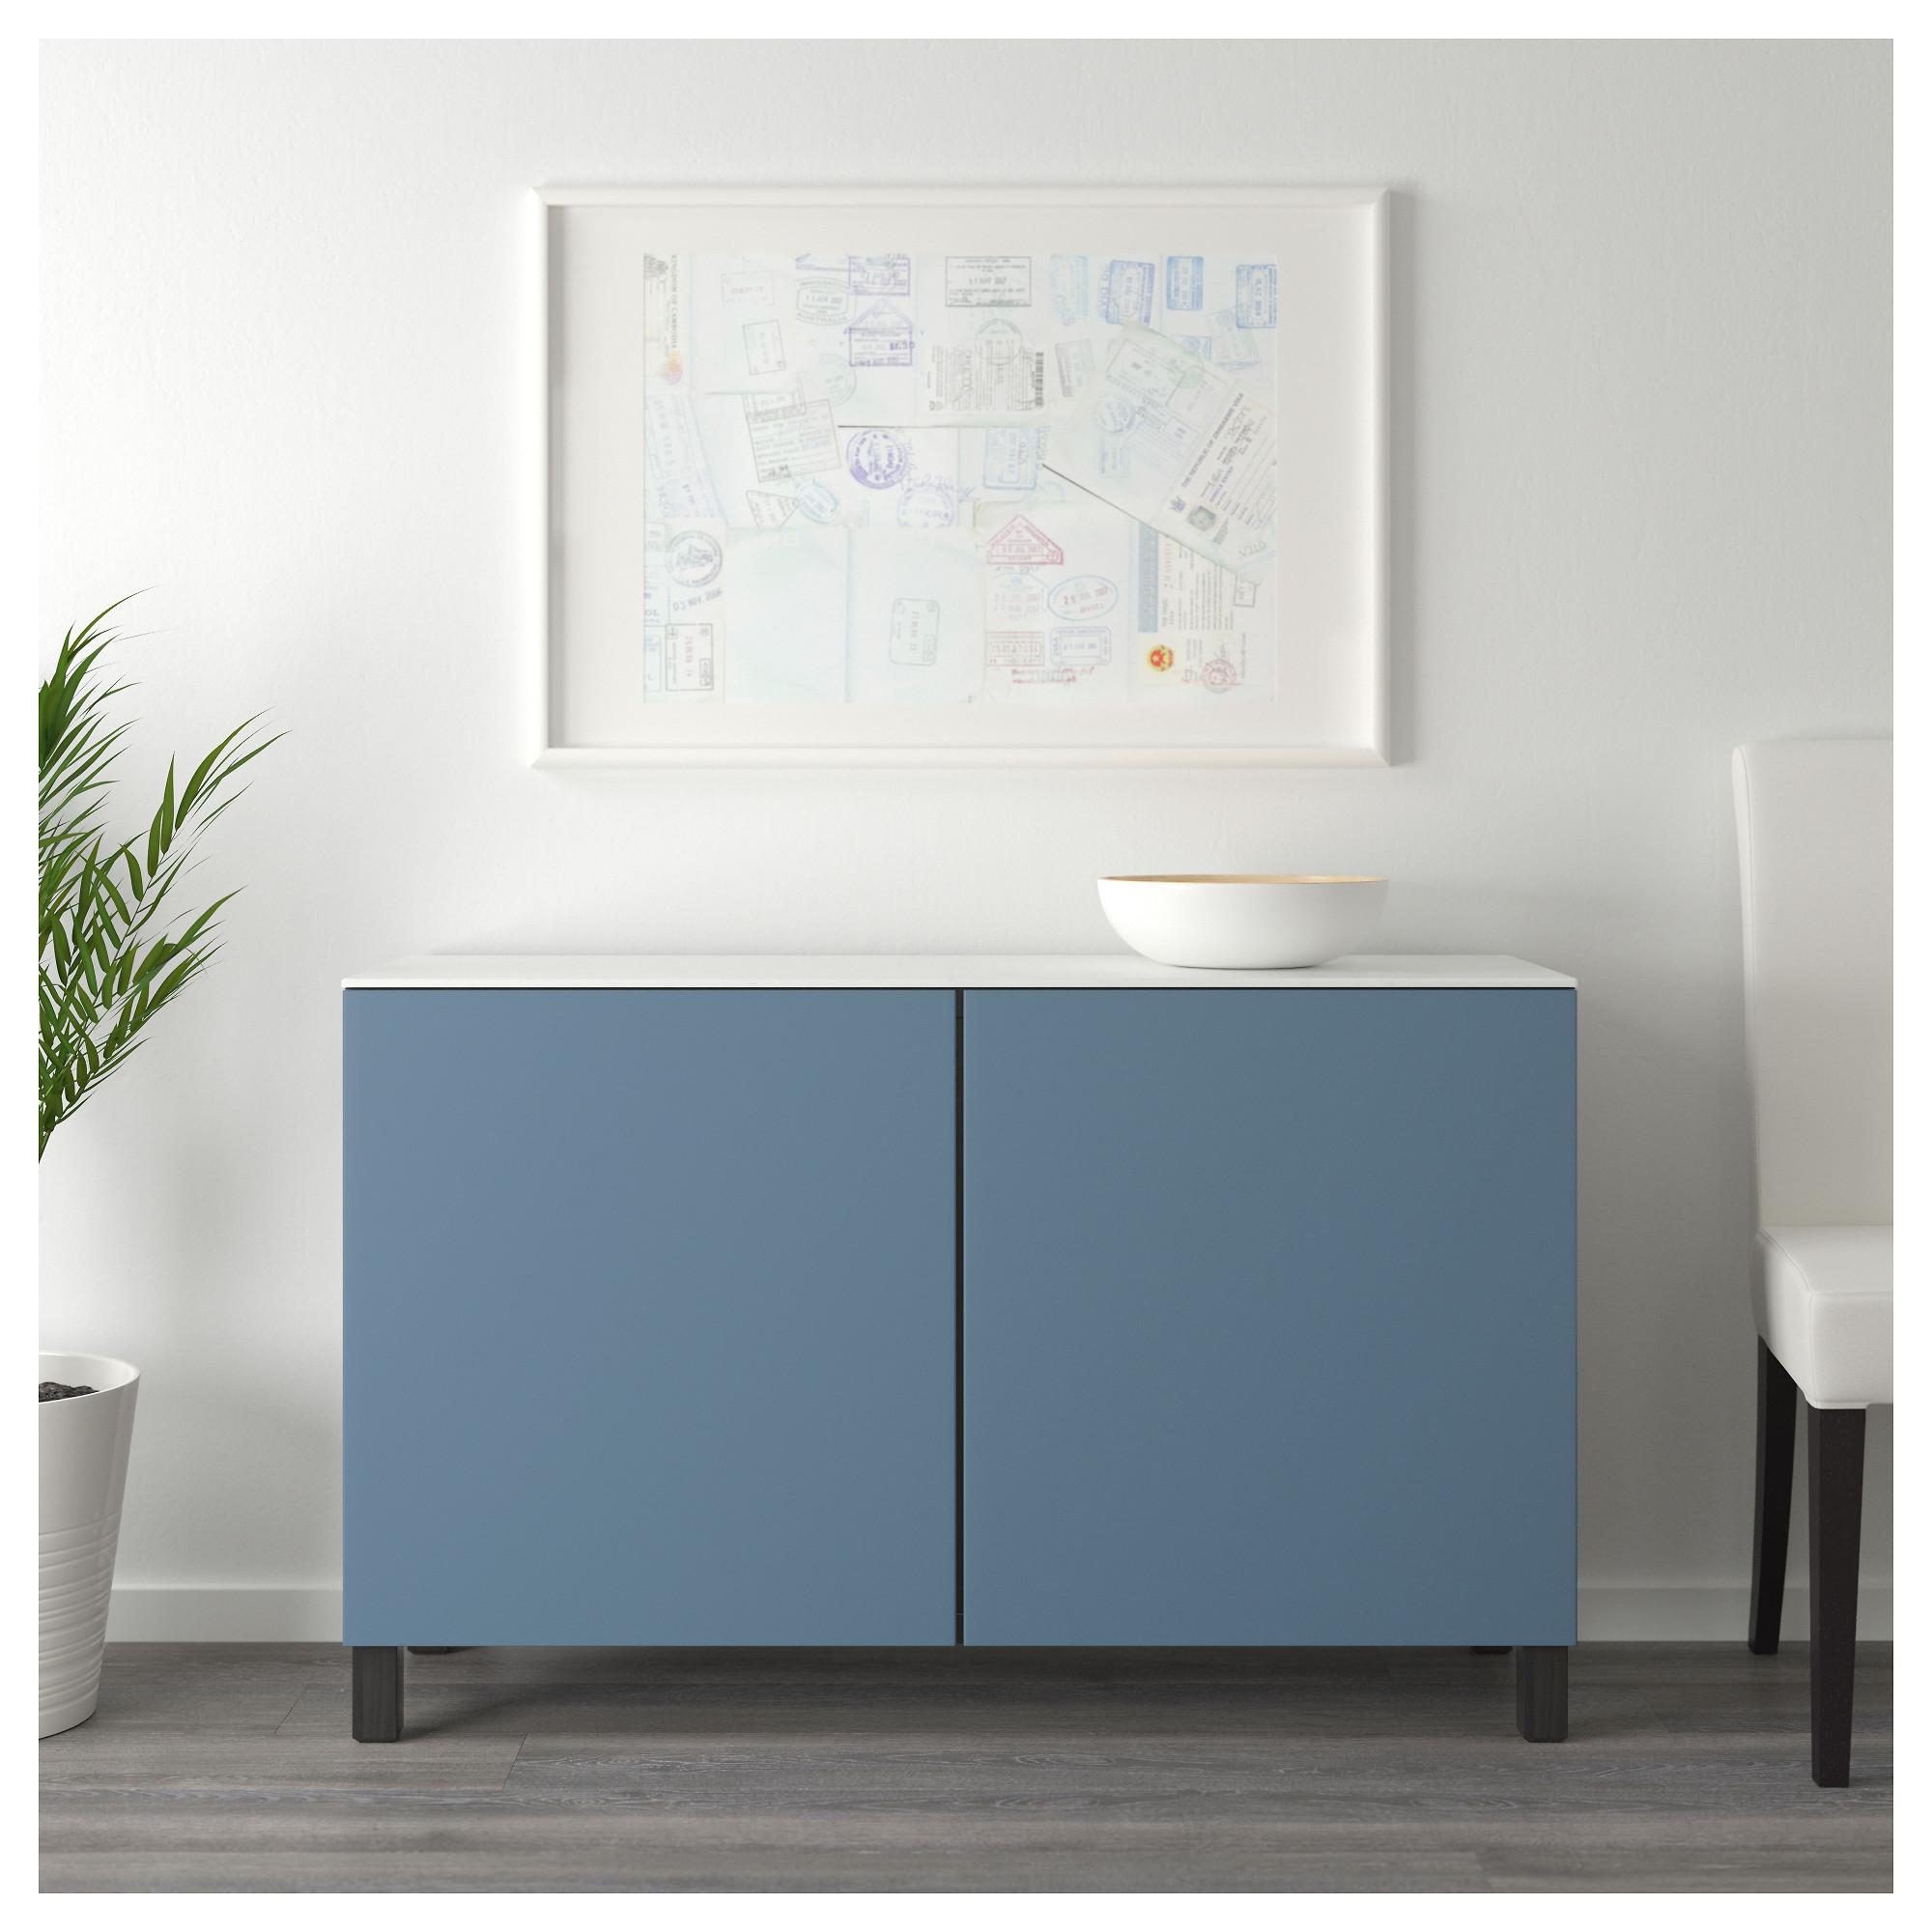 Комбинация для хранения с дверцами БЕСТО темно-синий артикуль № 092.448.62 в наличии. Online сайт IKEA Республика Беларусь. Недорогая доставка и установка.